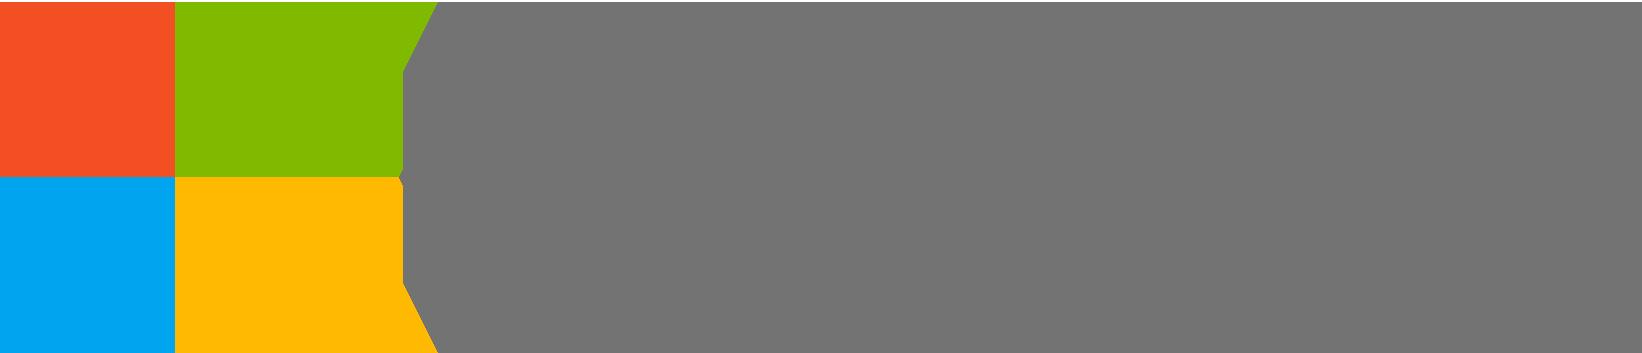 Qorus and Pickit Microsoft Partners